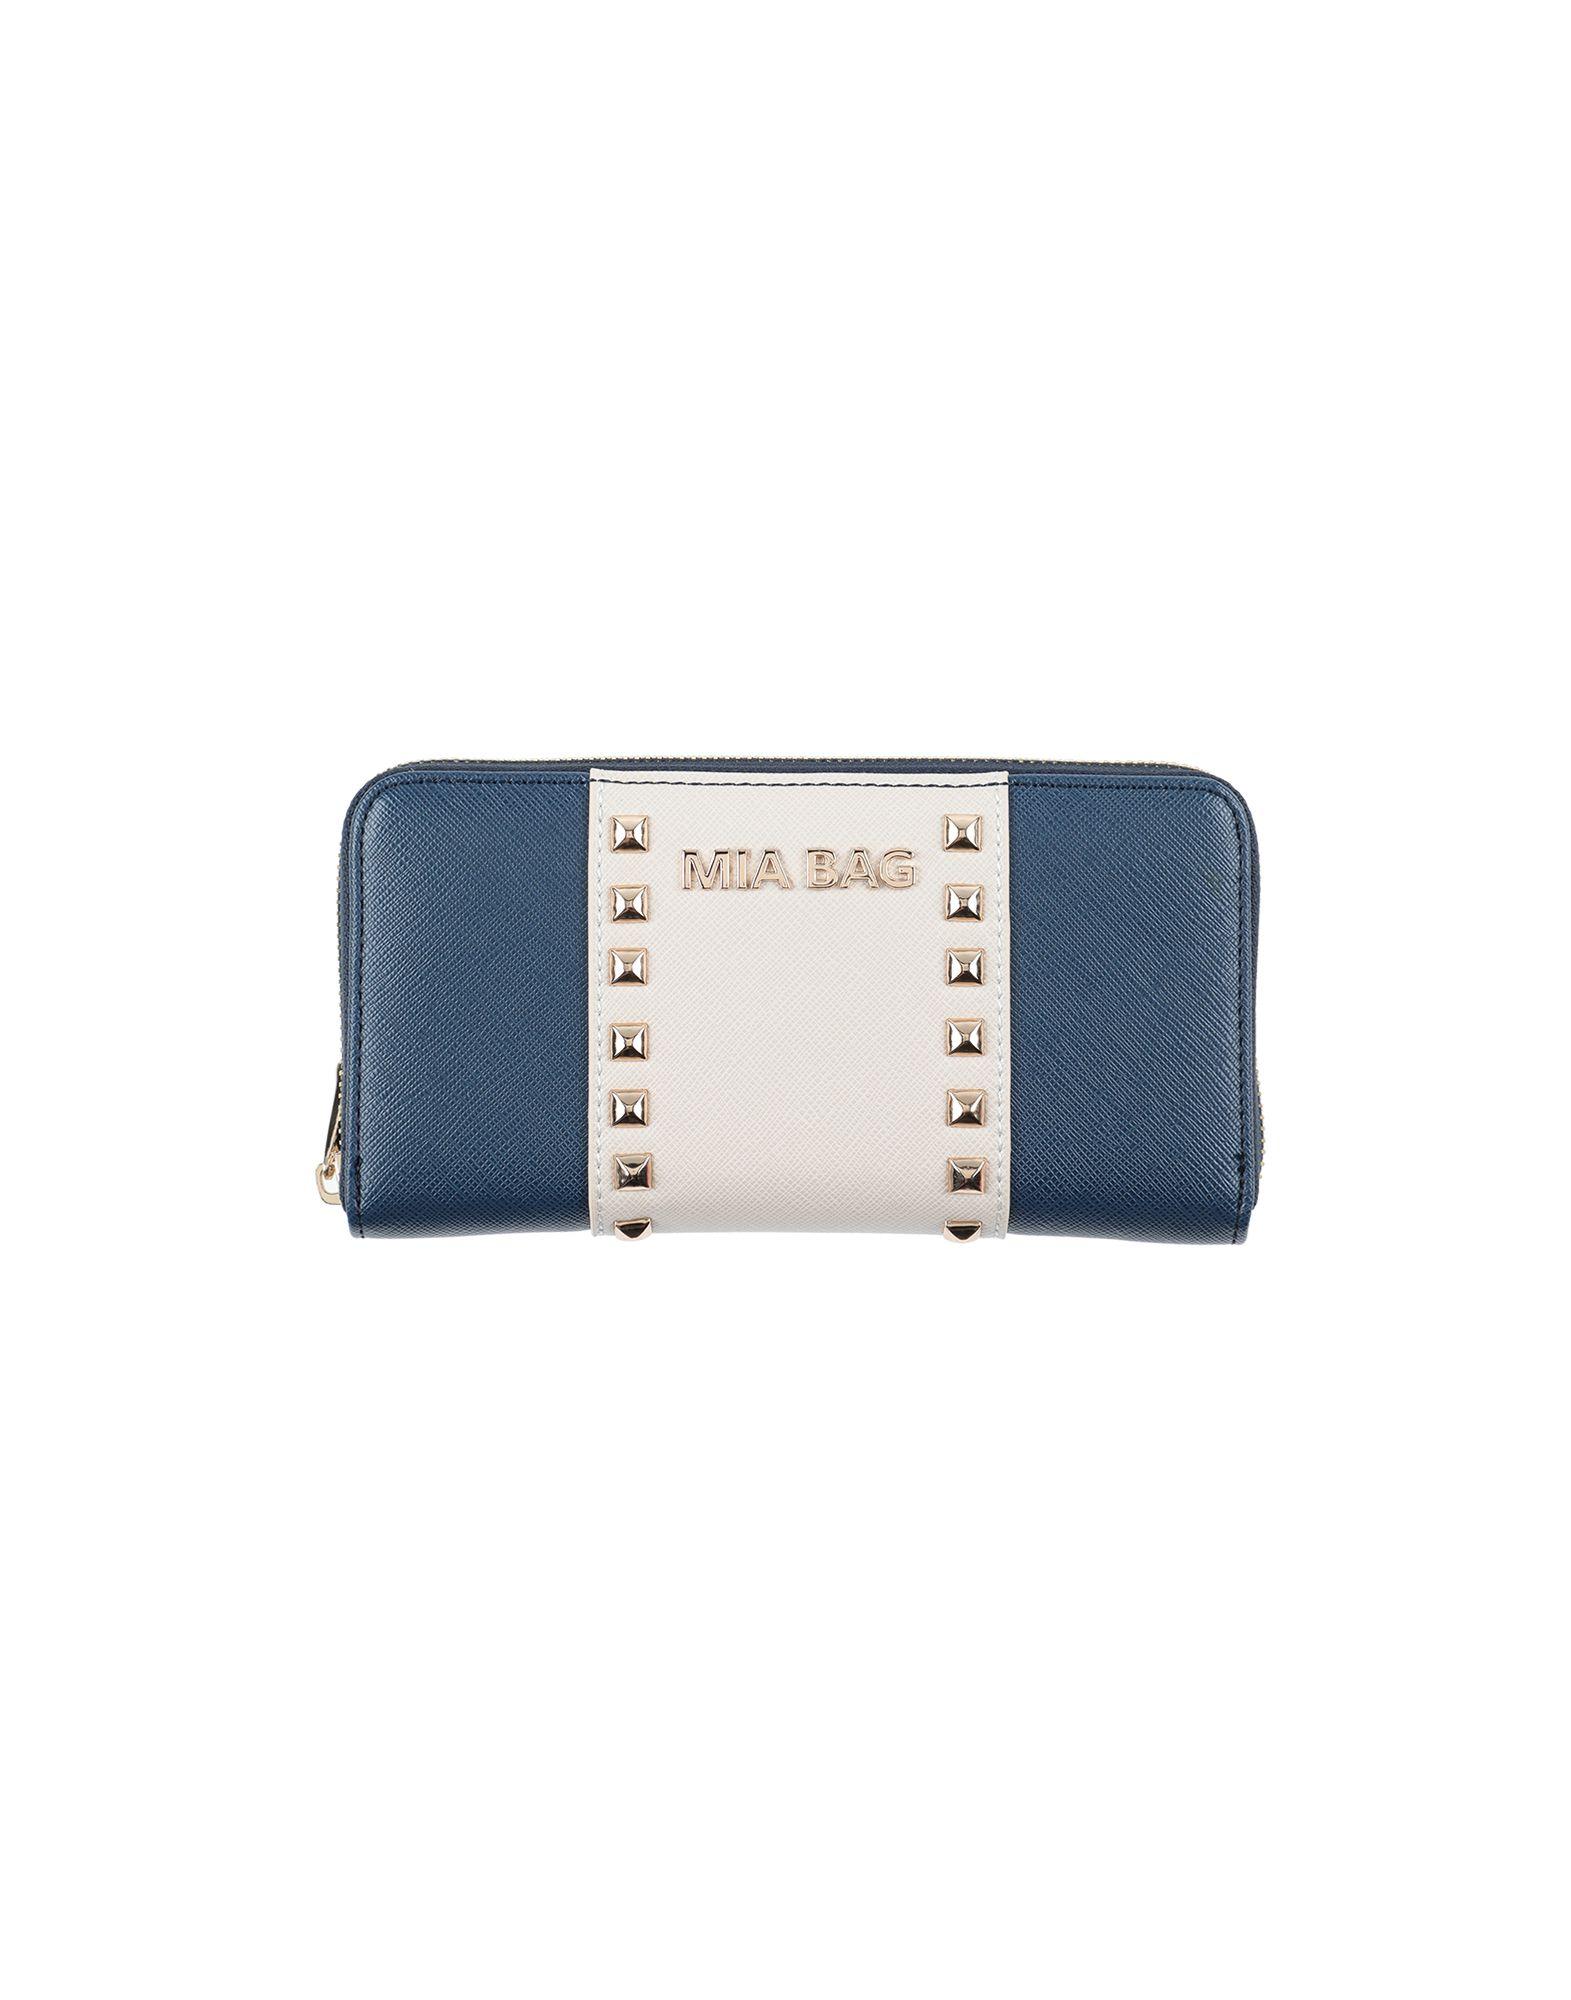 MIA BAG Бумажник mia bag чехол